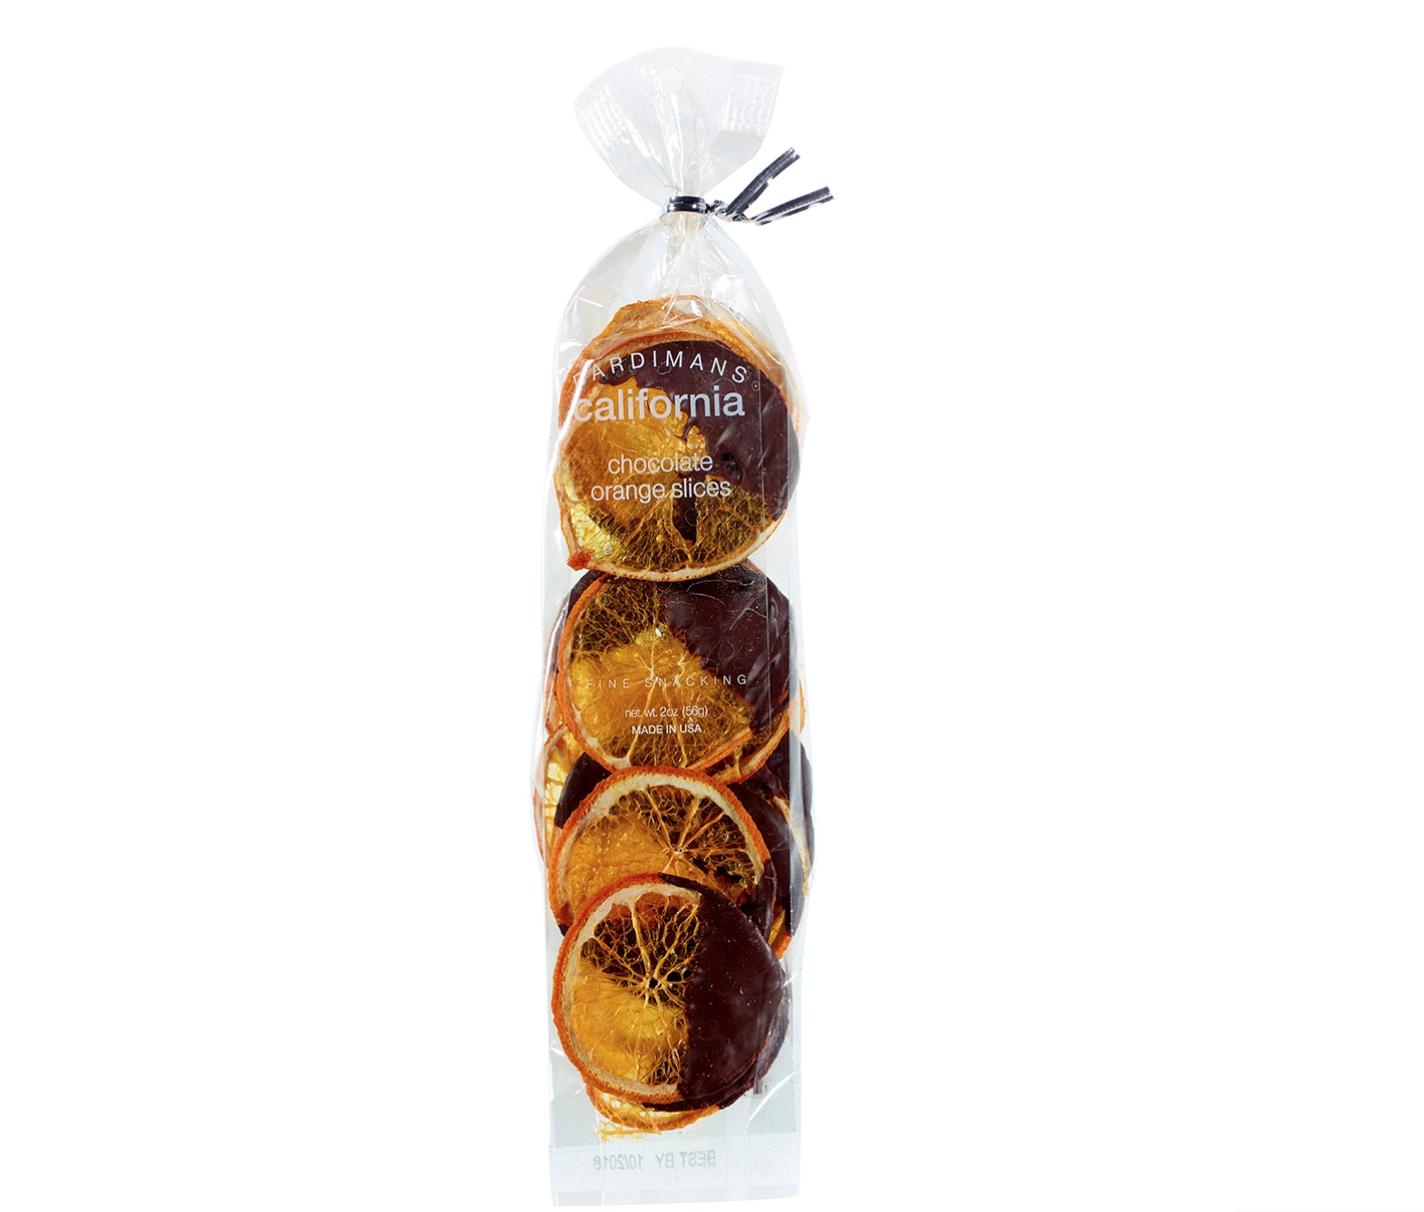 Dardimans Chocolate Orange Slices